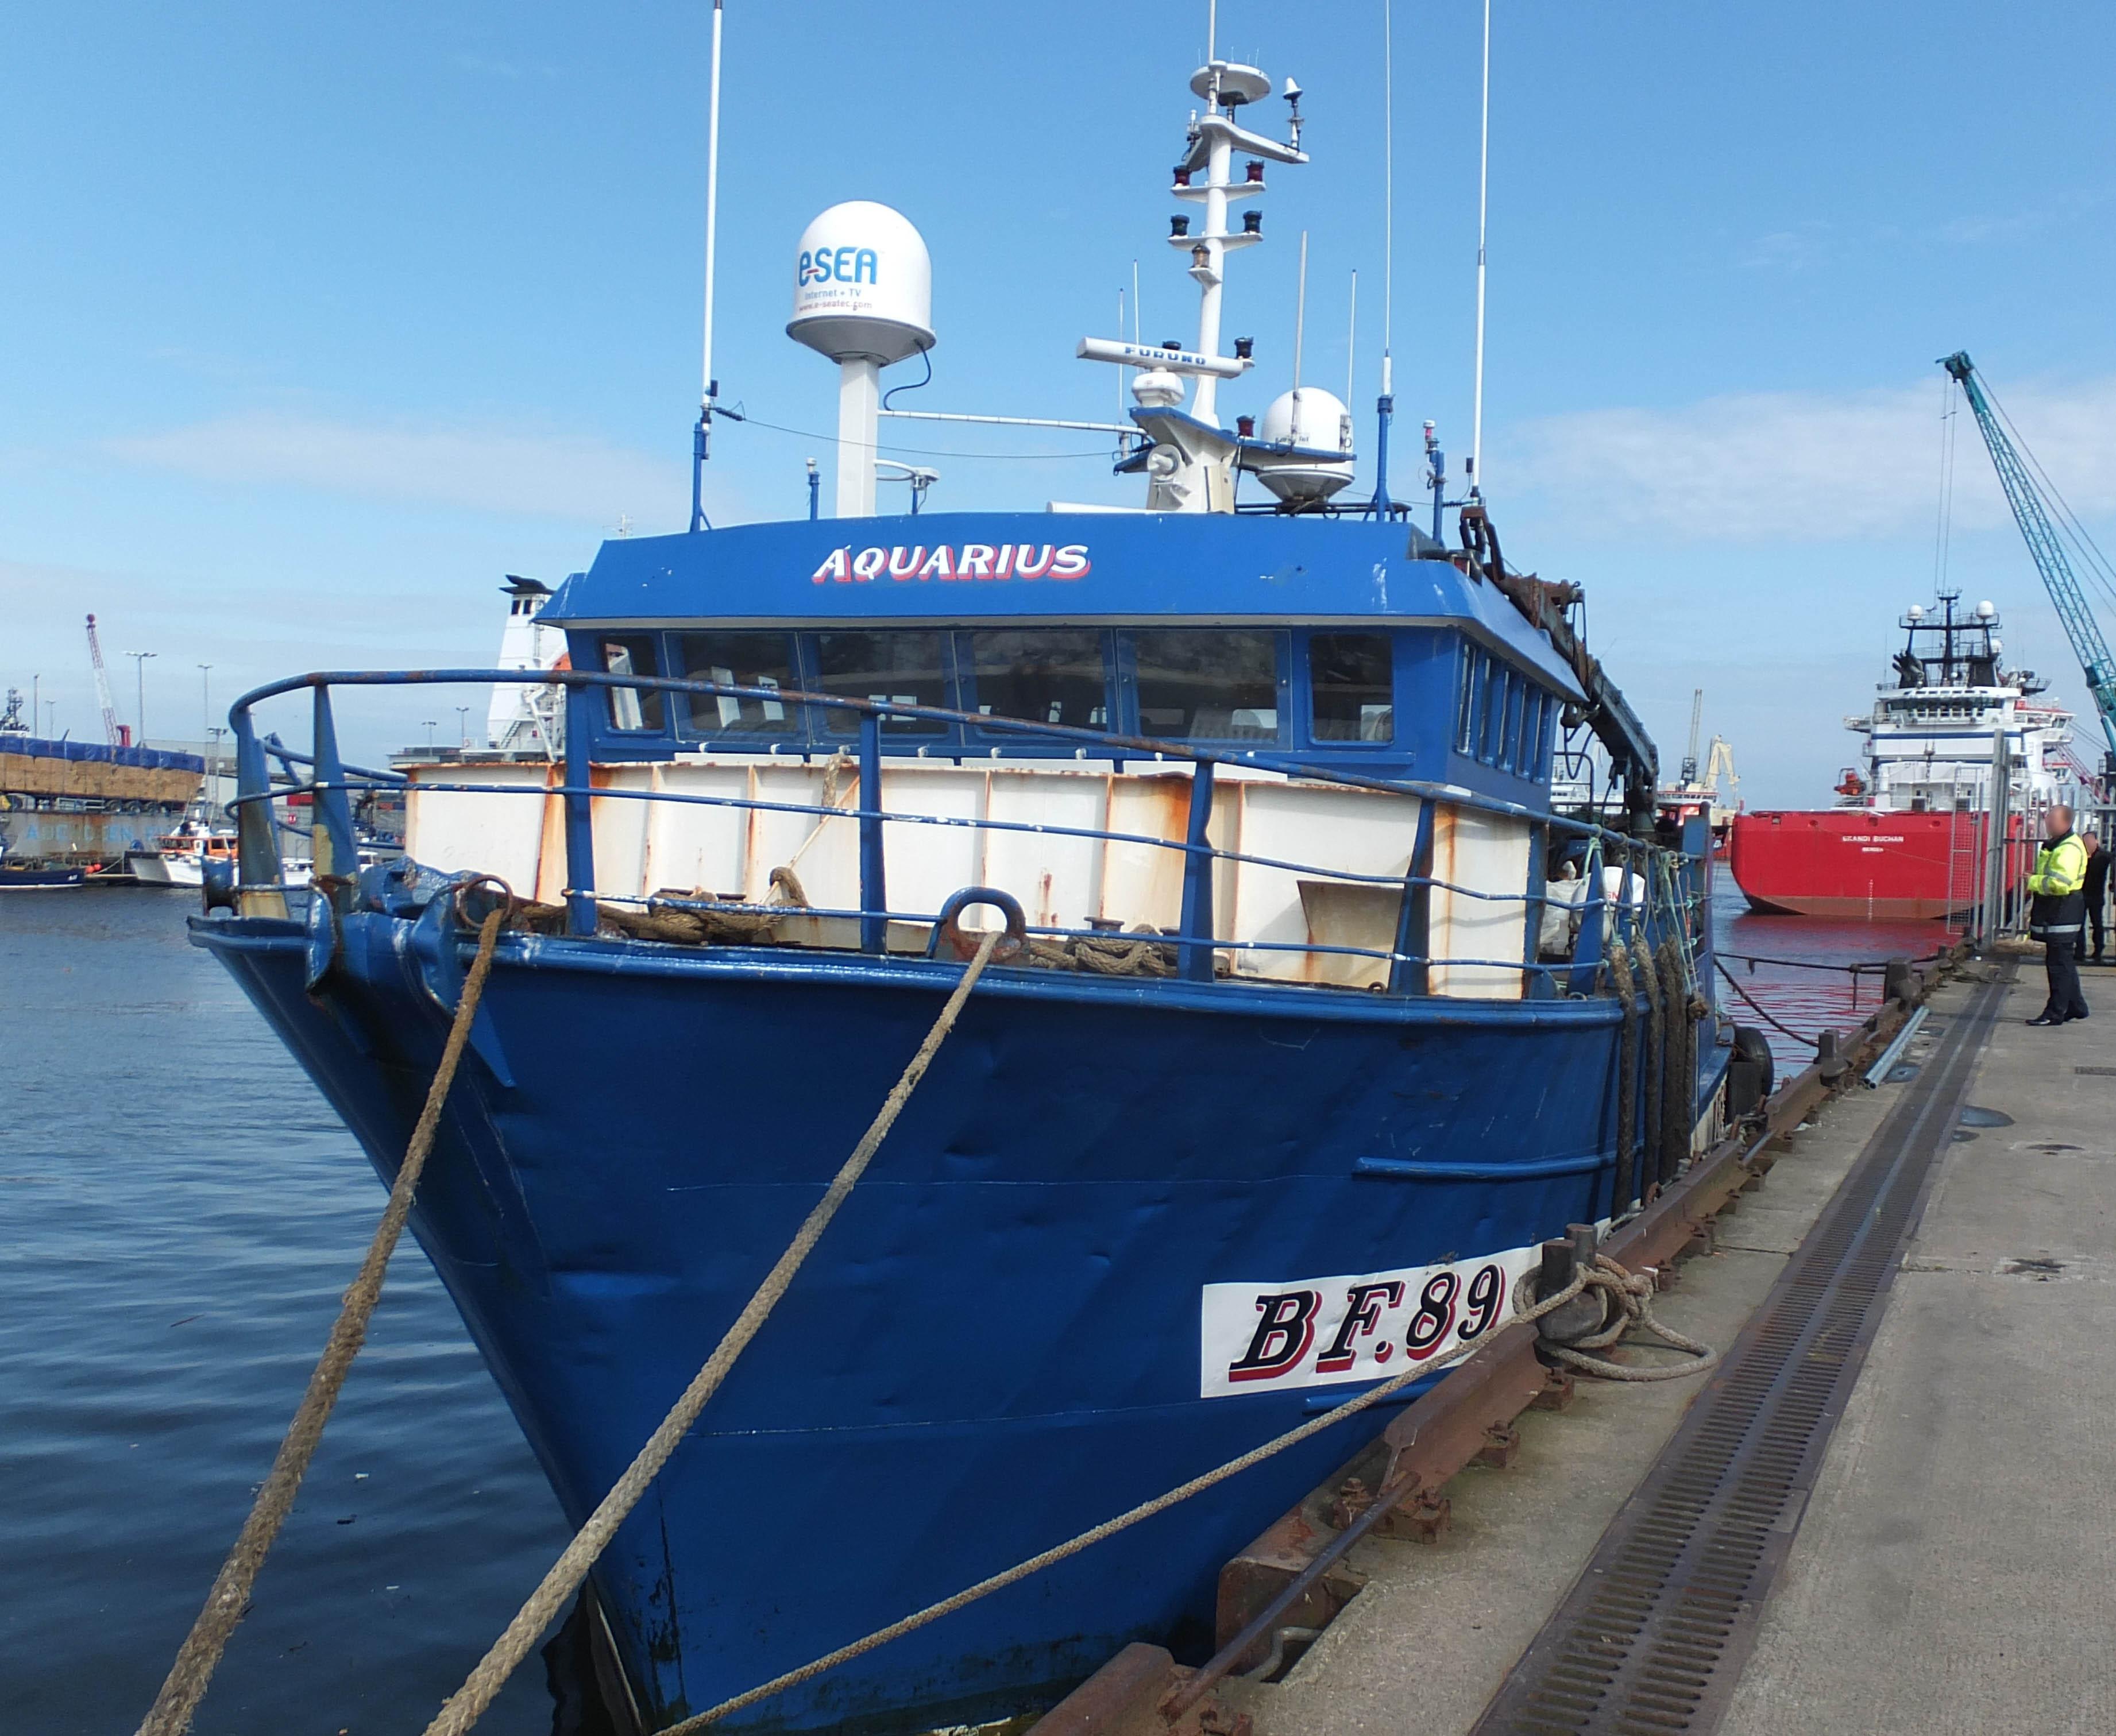 Photograph of Aquarius alongside at Aberdeen